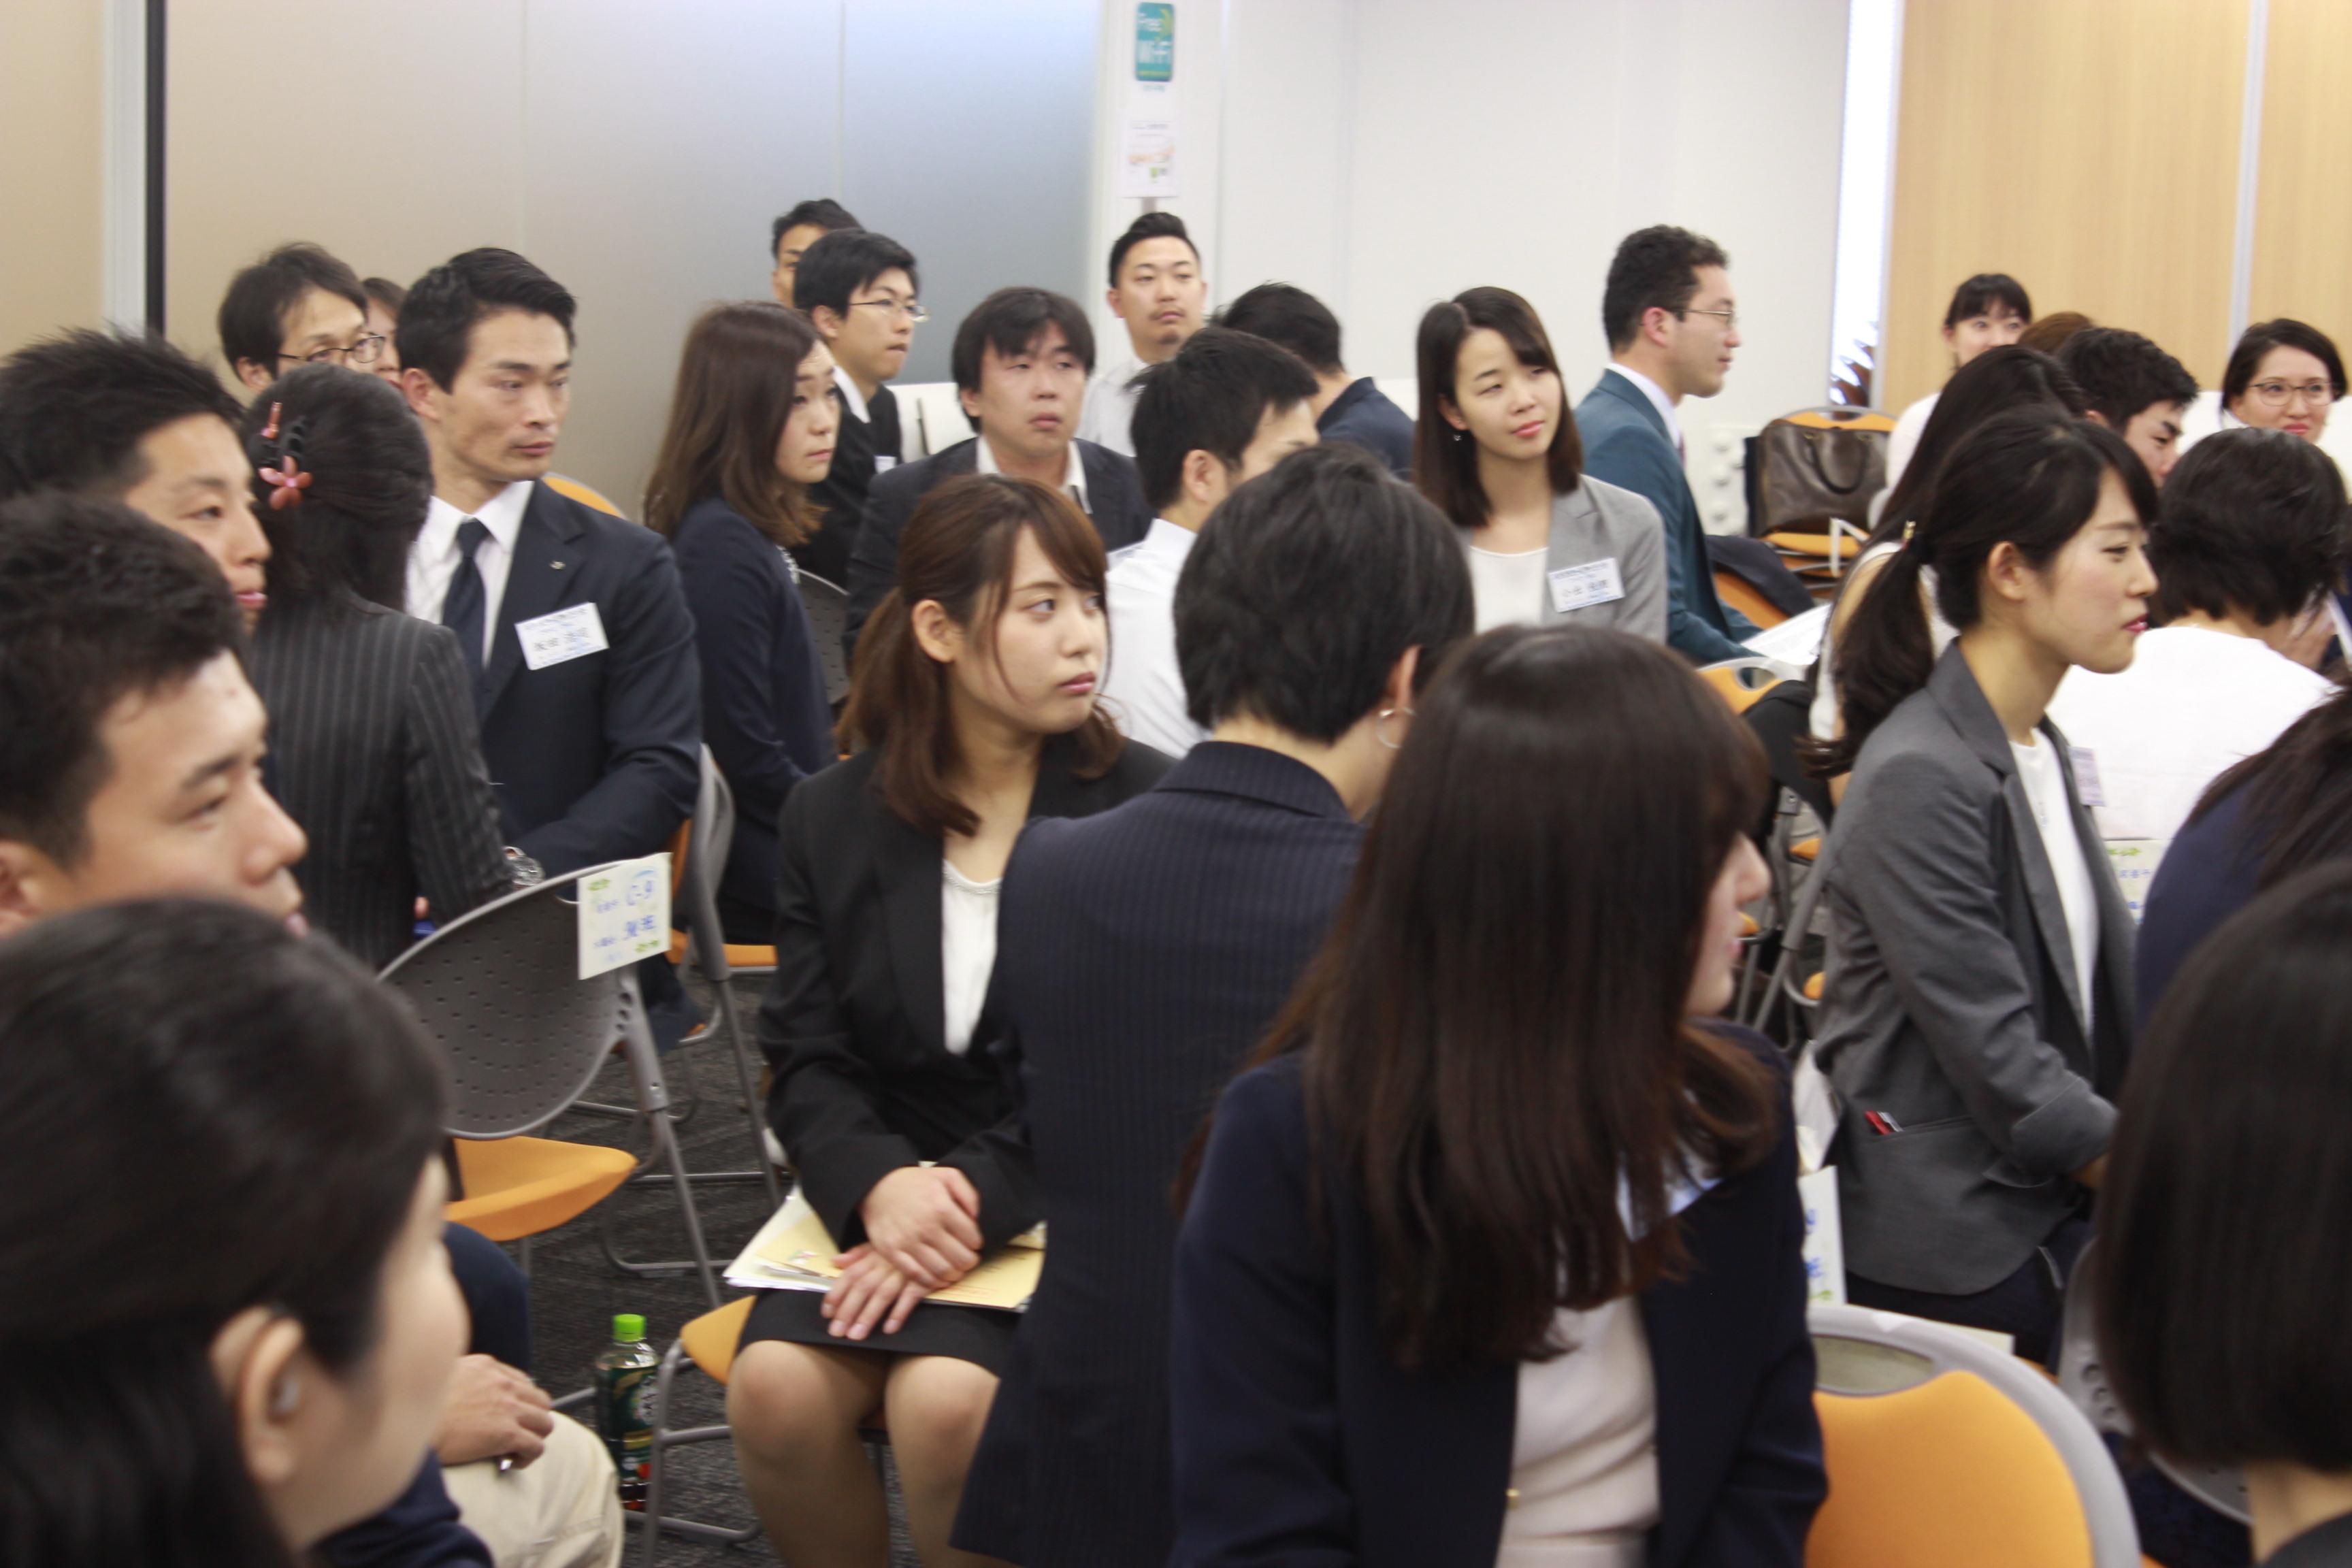 IMG 7779ewr - 7月20日関東若獅子の会